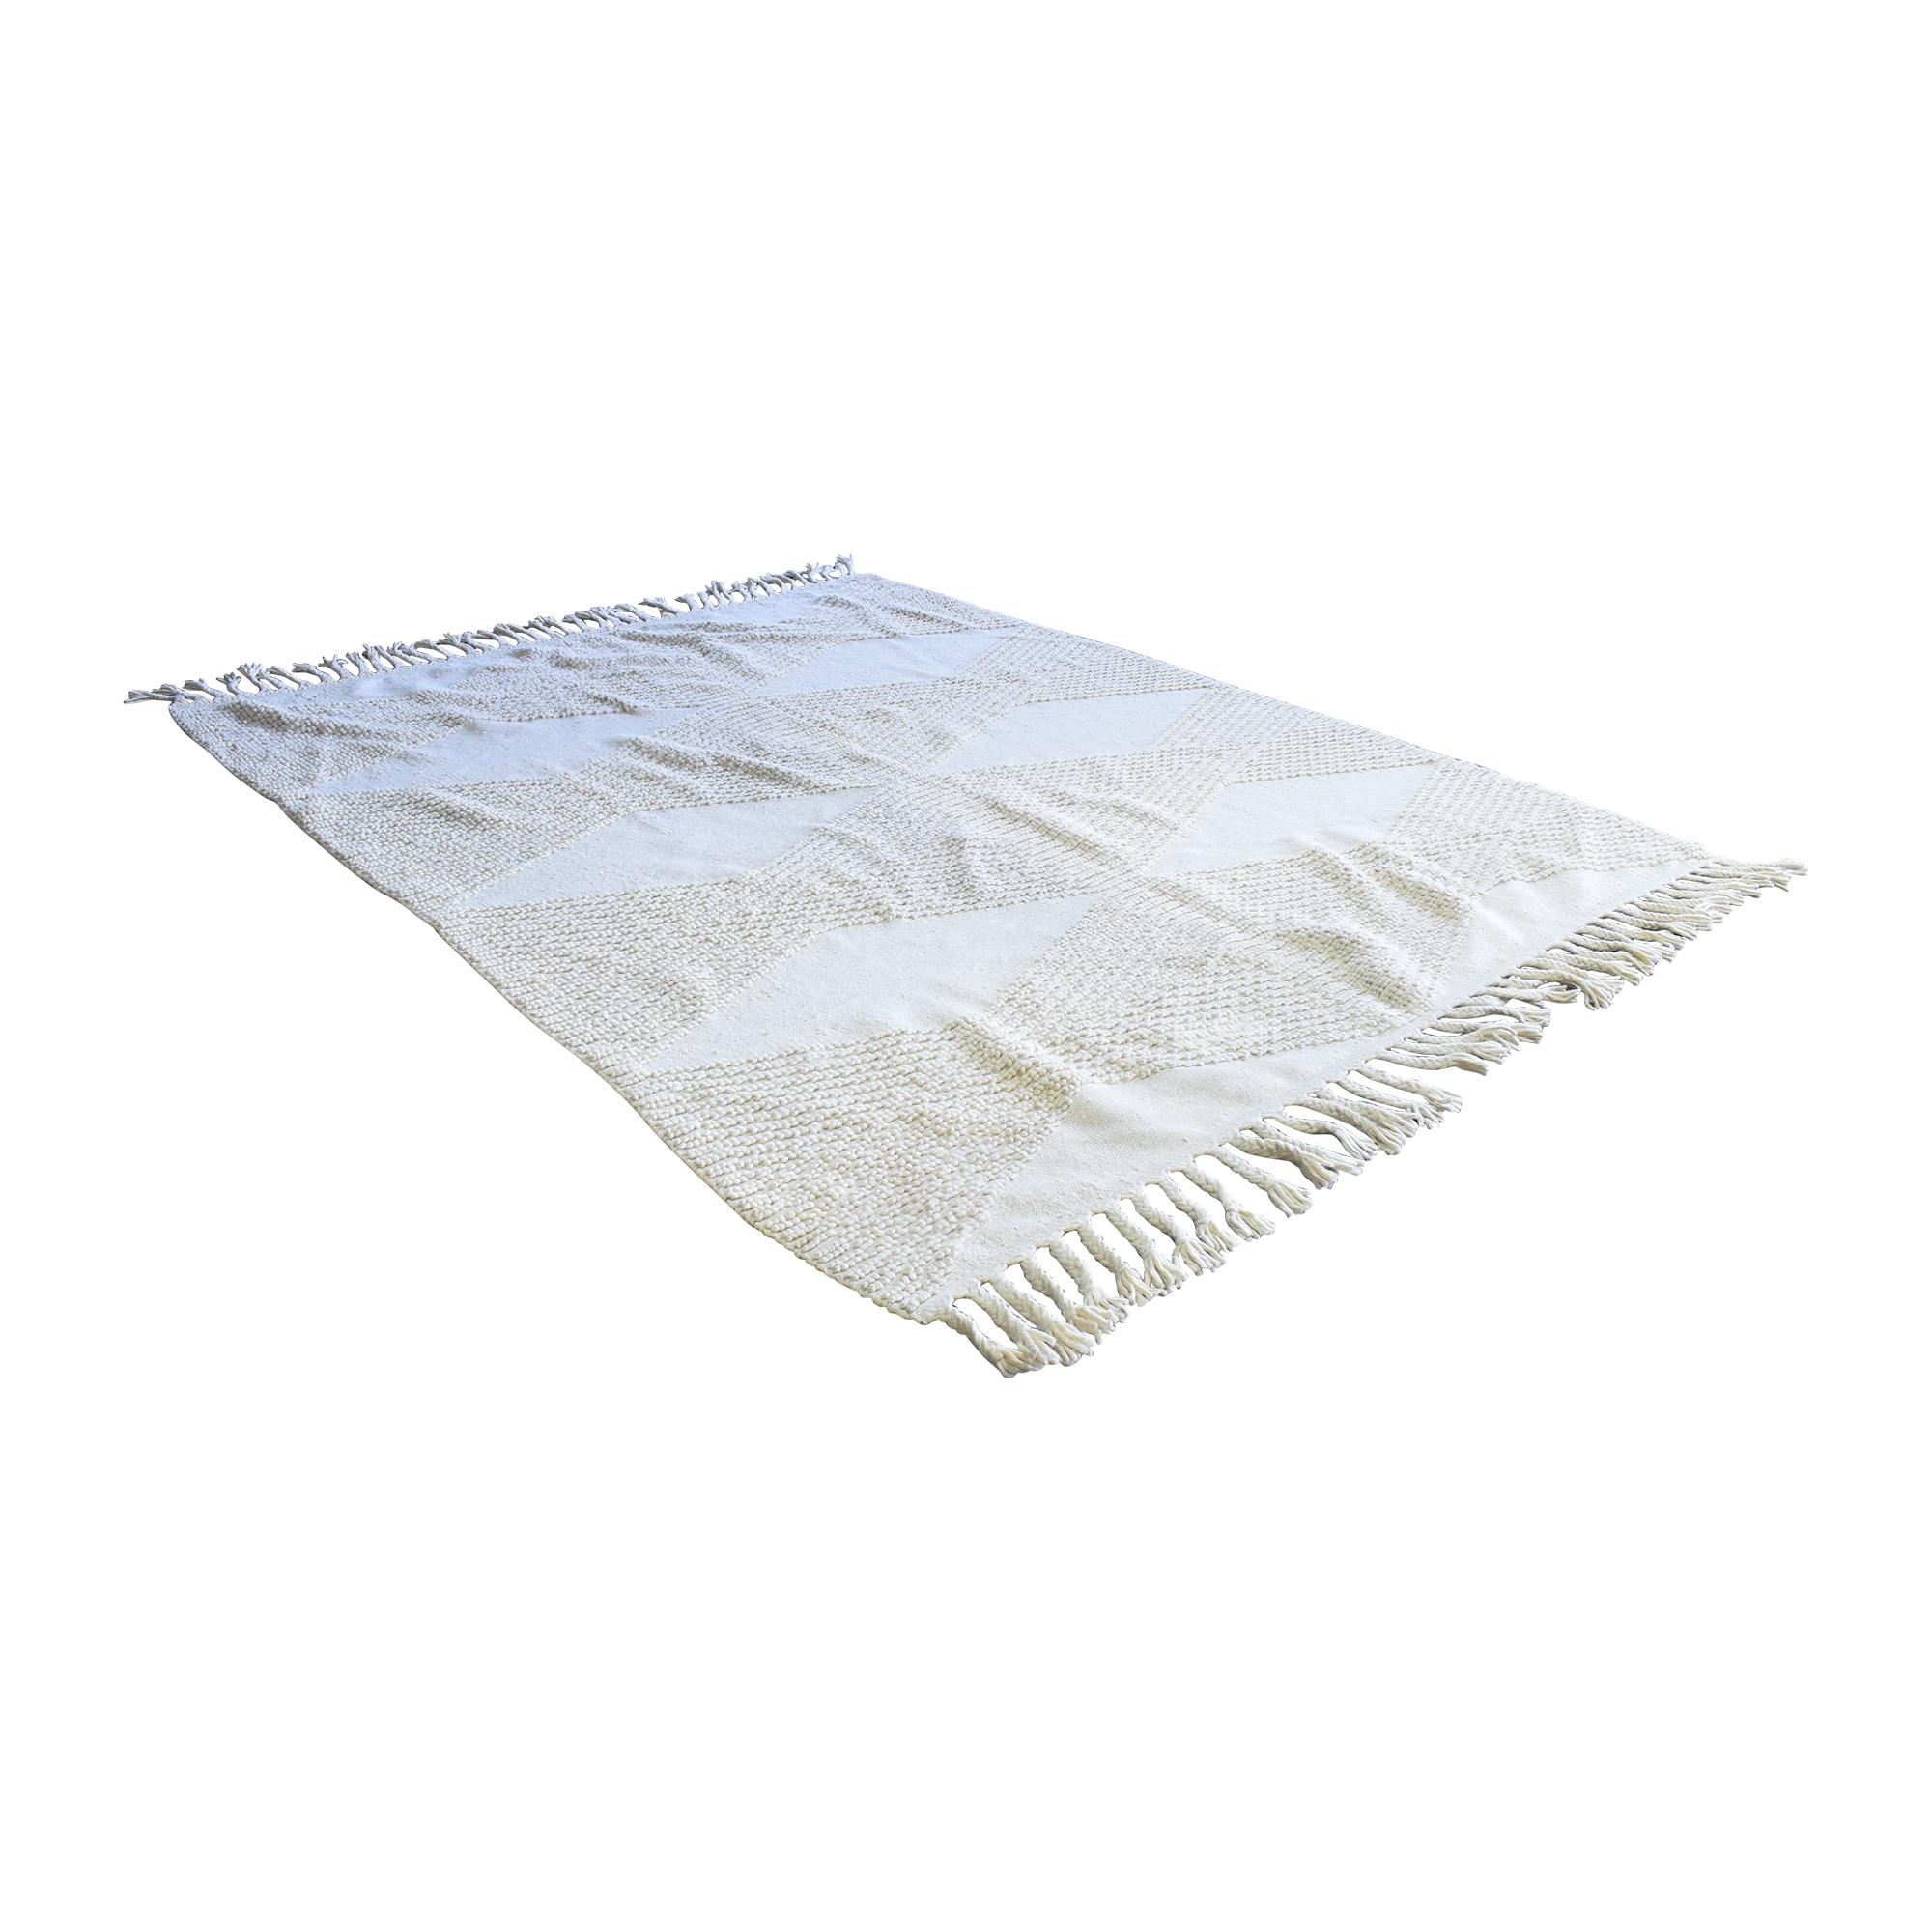 World Market Wool Area Rug sale